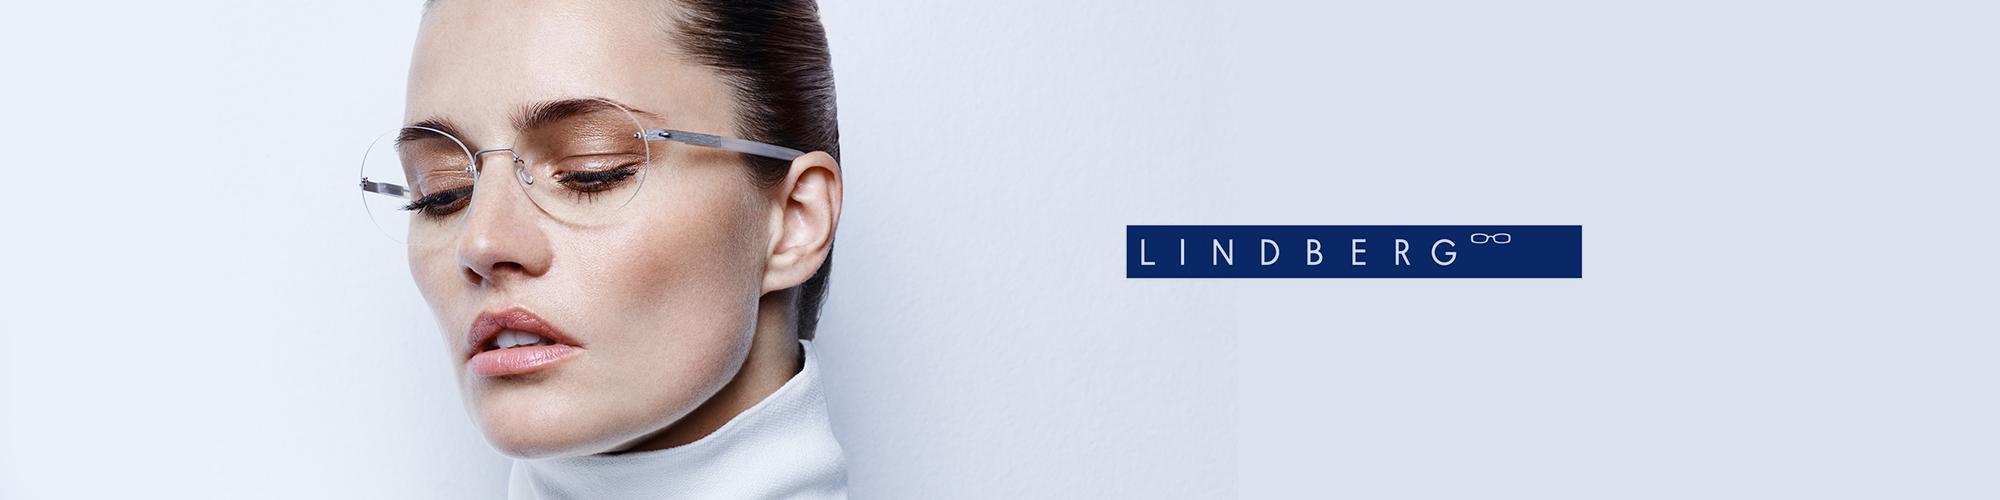 LINDBURG